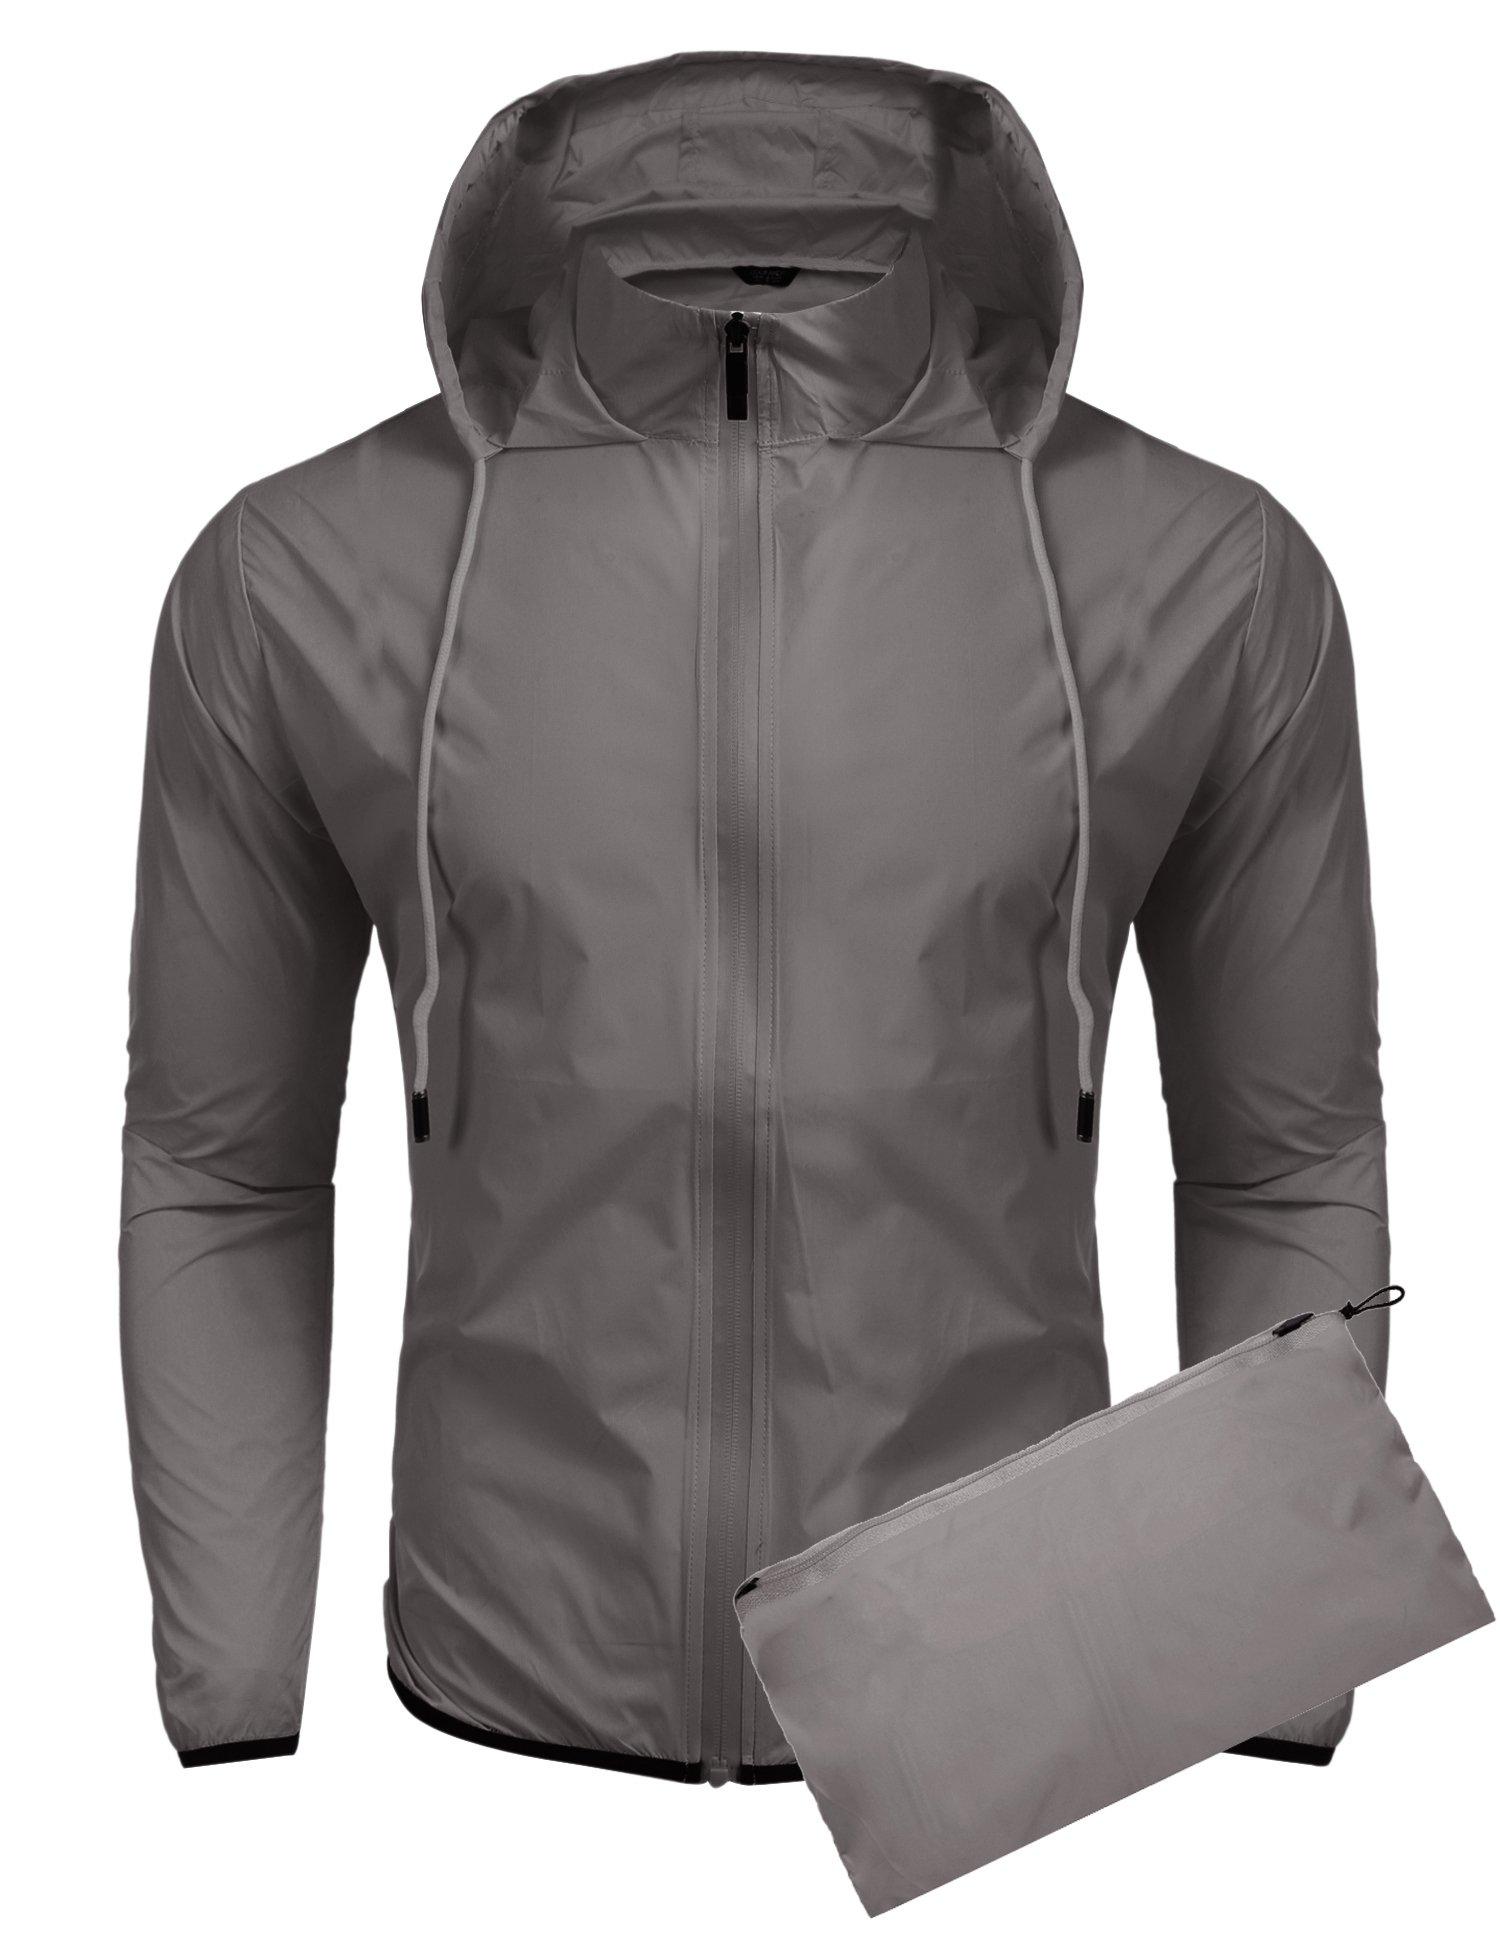 Jinidu Men's Cycling Skin Coat Jersey Bicycle Windproof Jacket Rain Coat (Medium, Light Khaki) by Jinidu (Image #1)